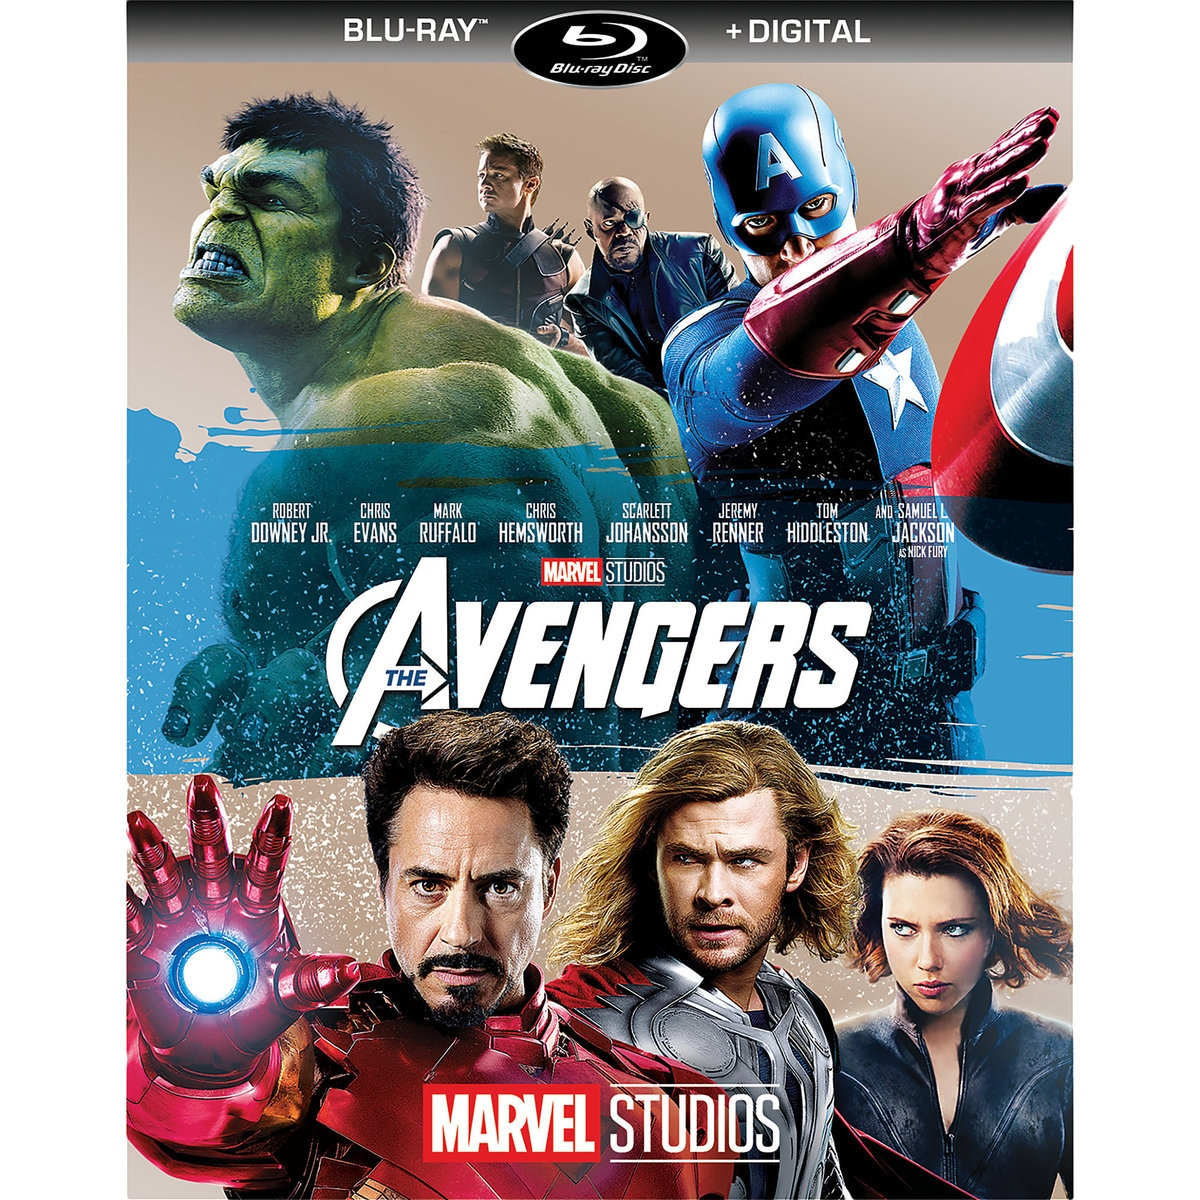 marvels the avengers blu ray digital copy - The Avengers